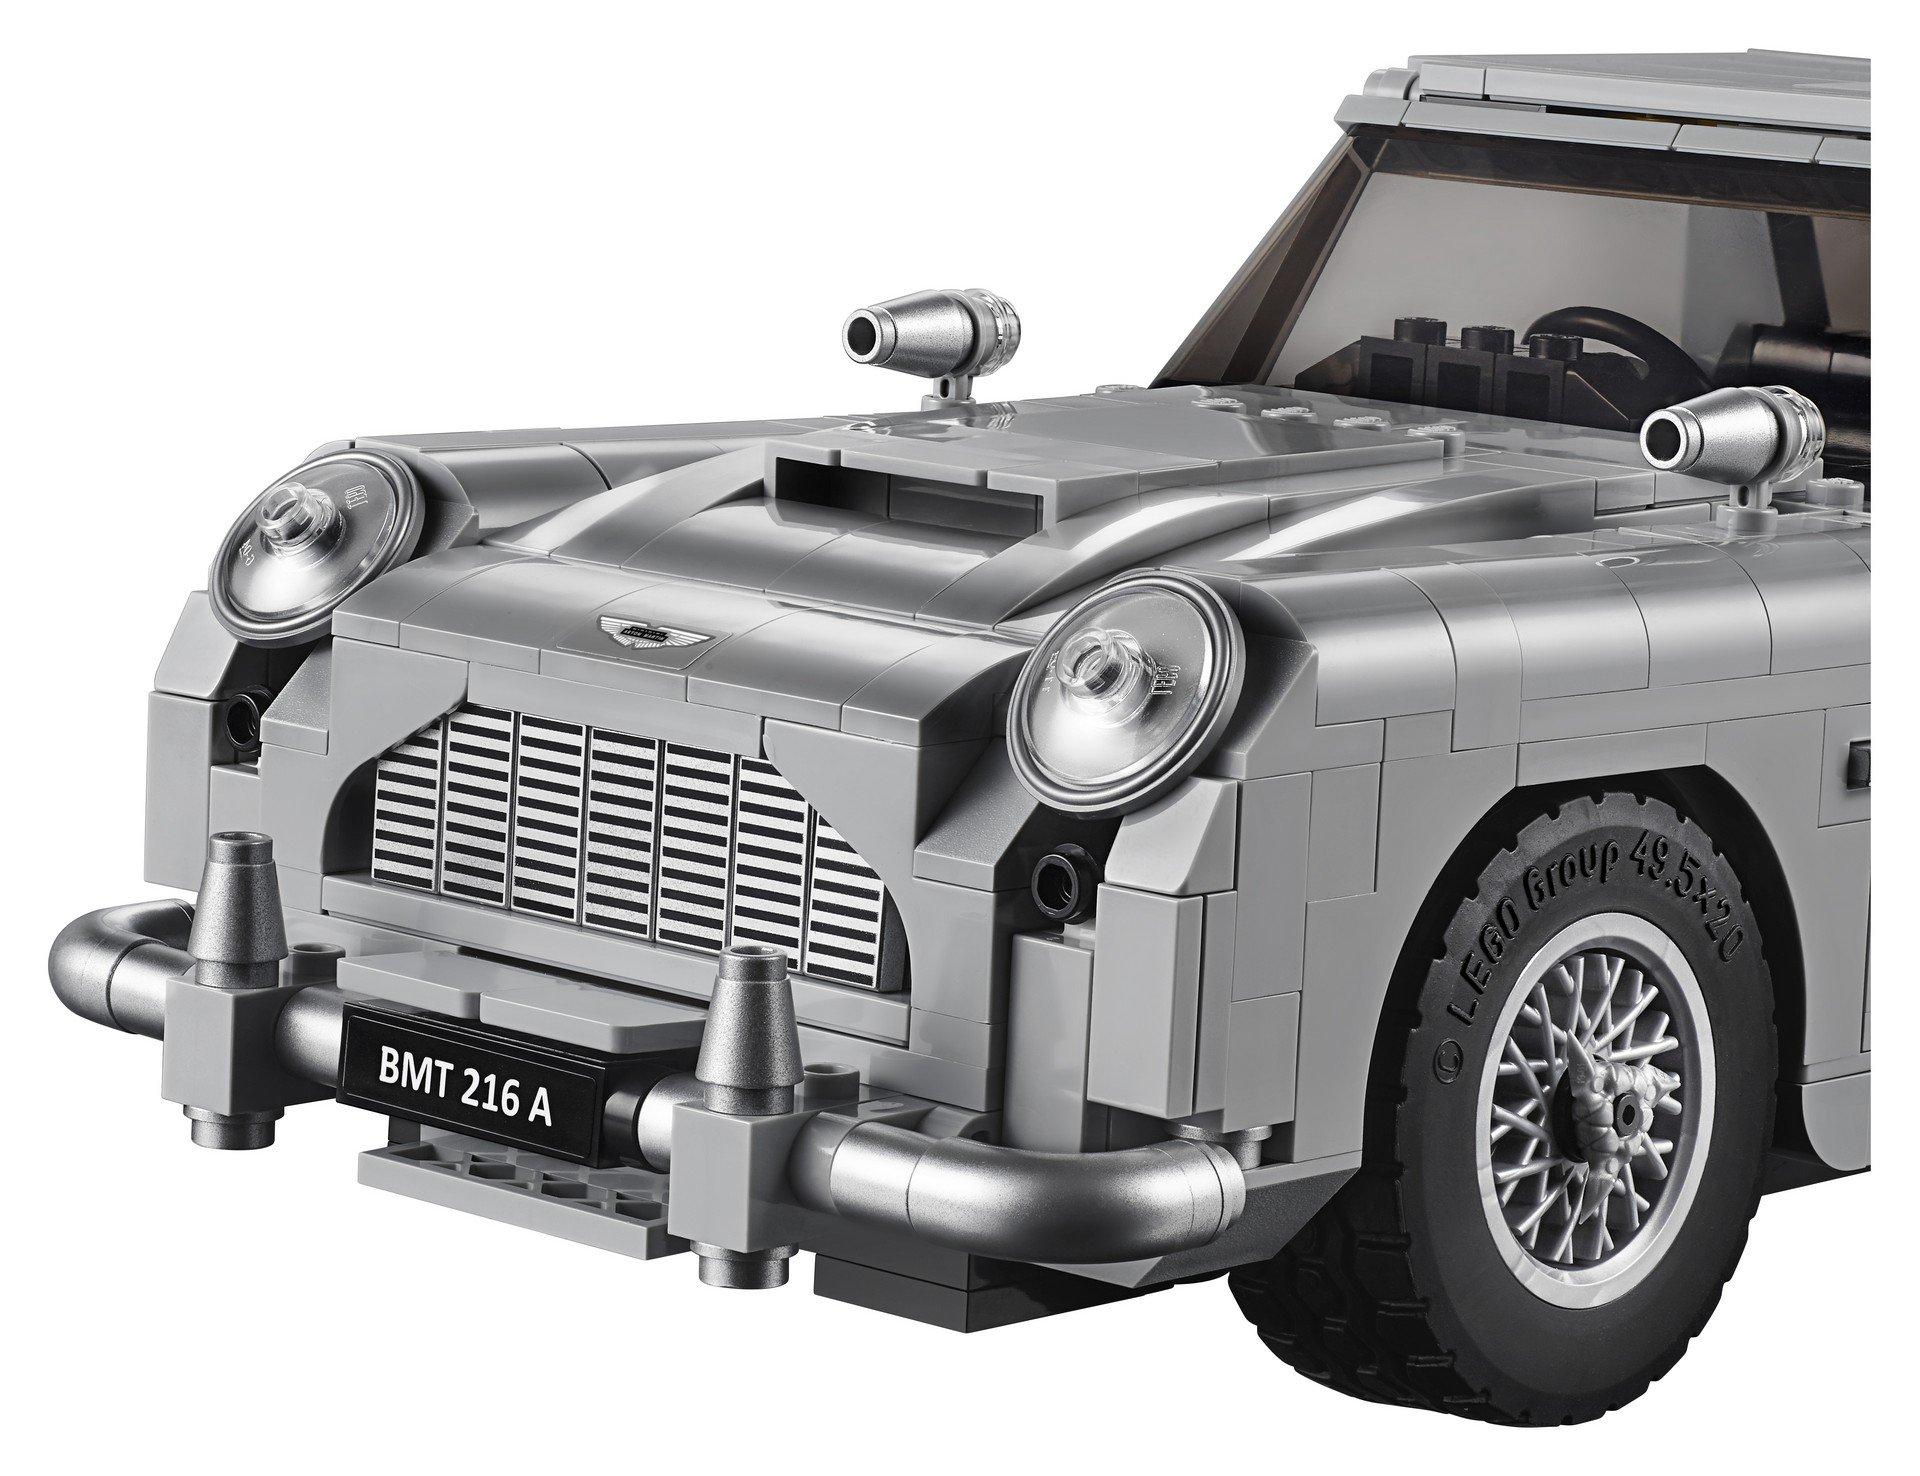 Lego Aston Martin DB5 (75)